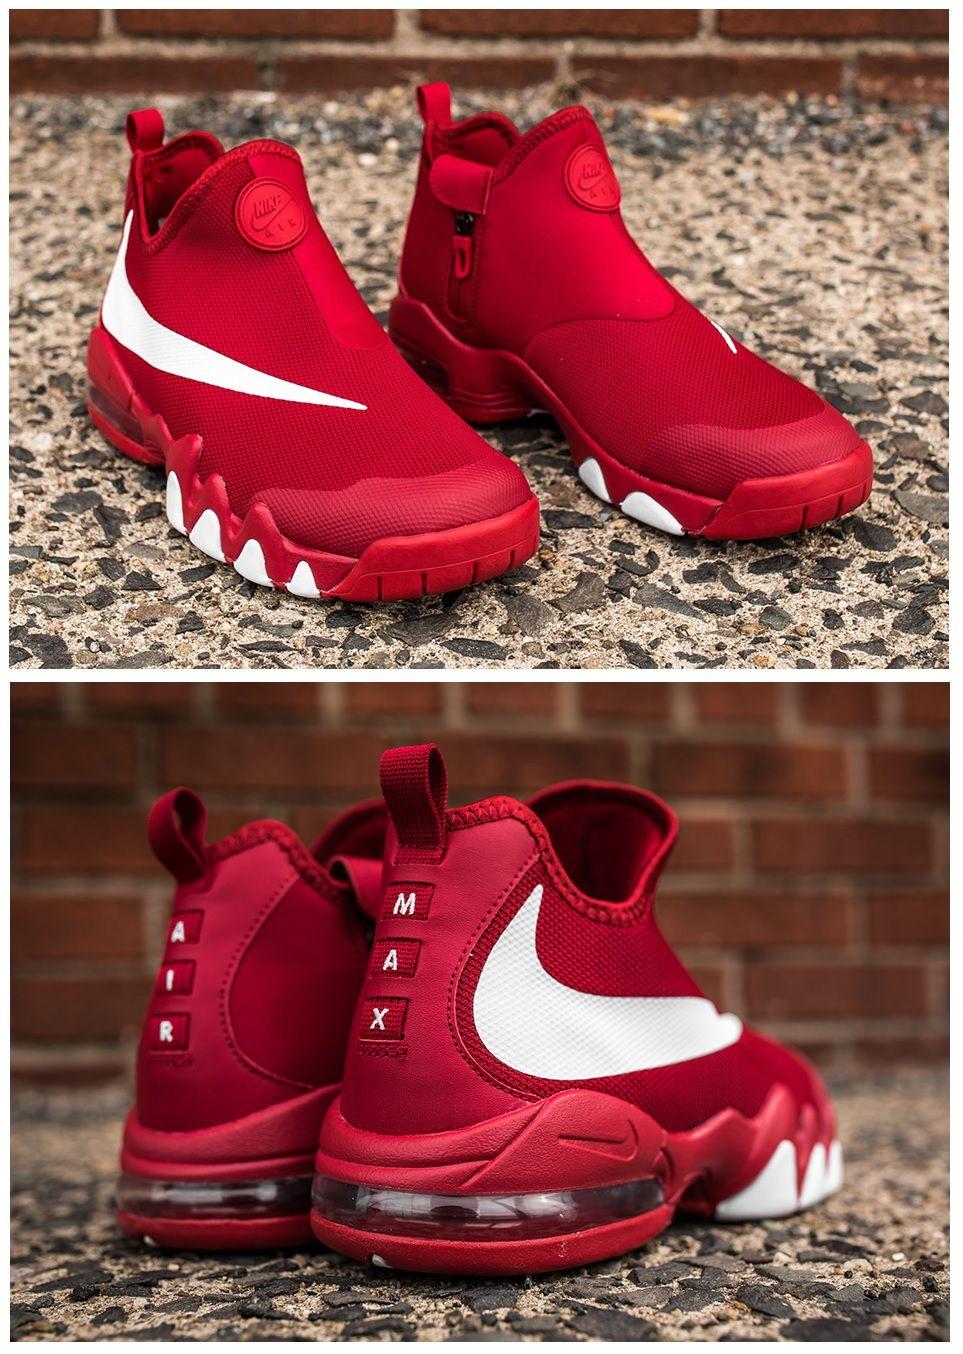 4 Big BarkleyUniversity Nike RedShoes Nuggas Charles Swoosh pqUzVSM